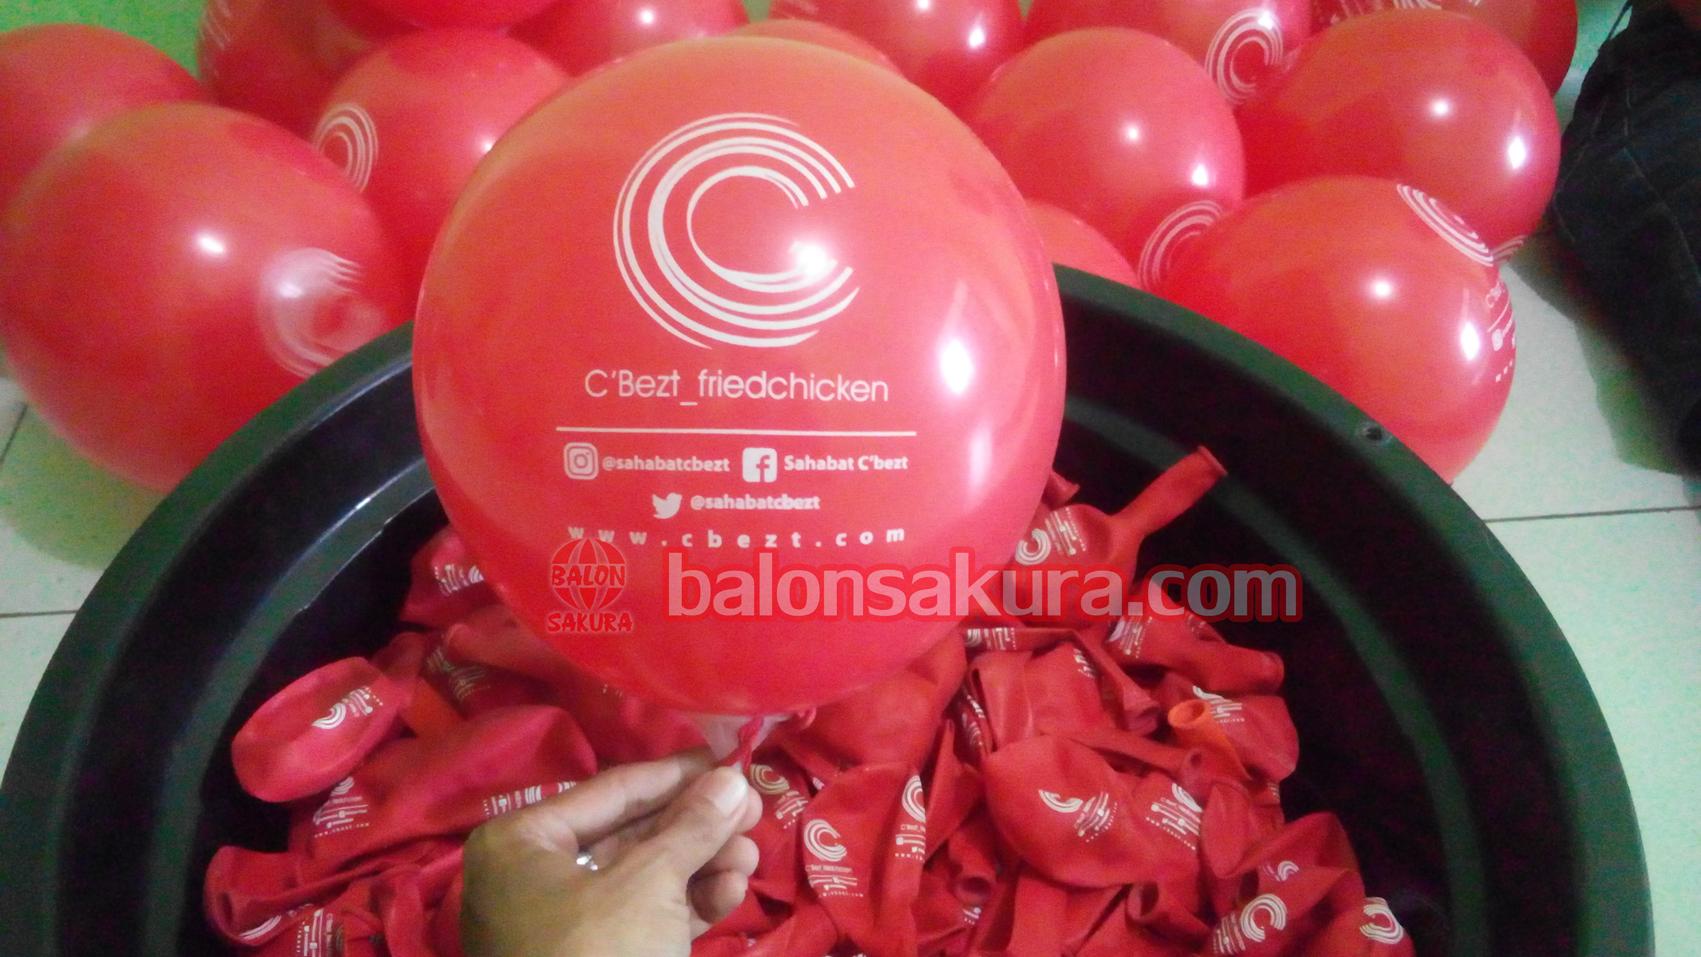 balon sablon logo